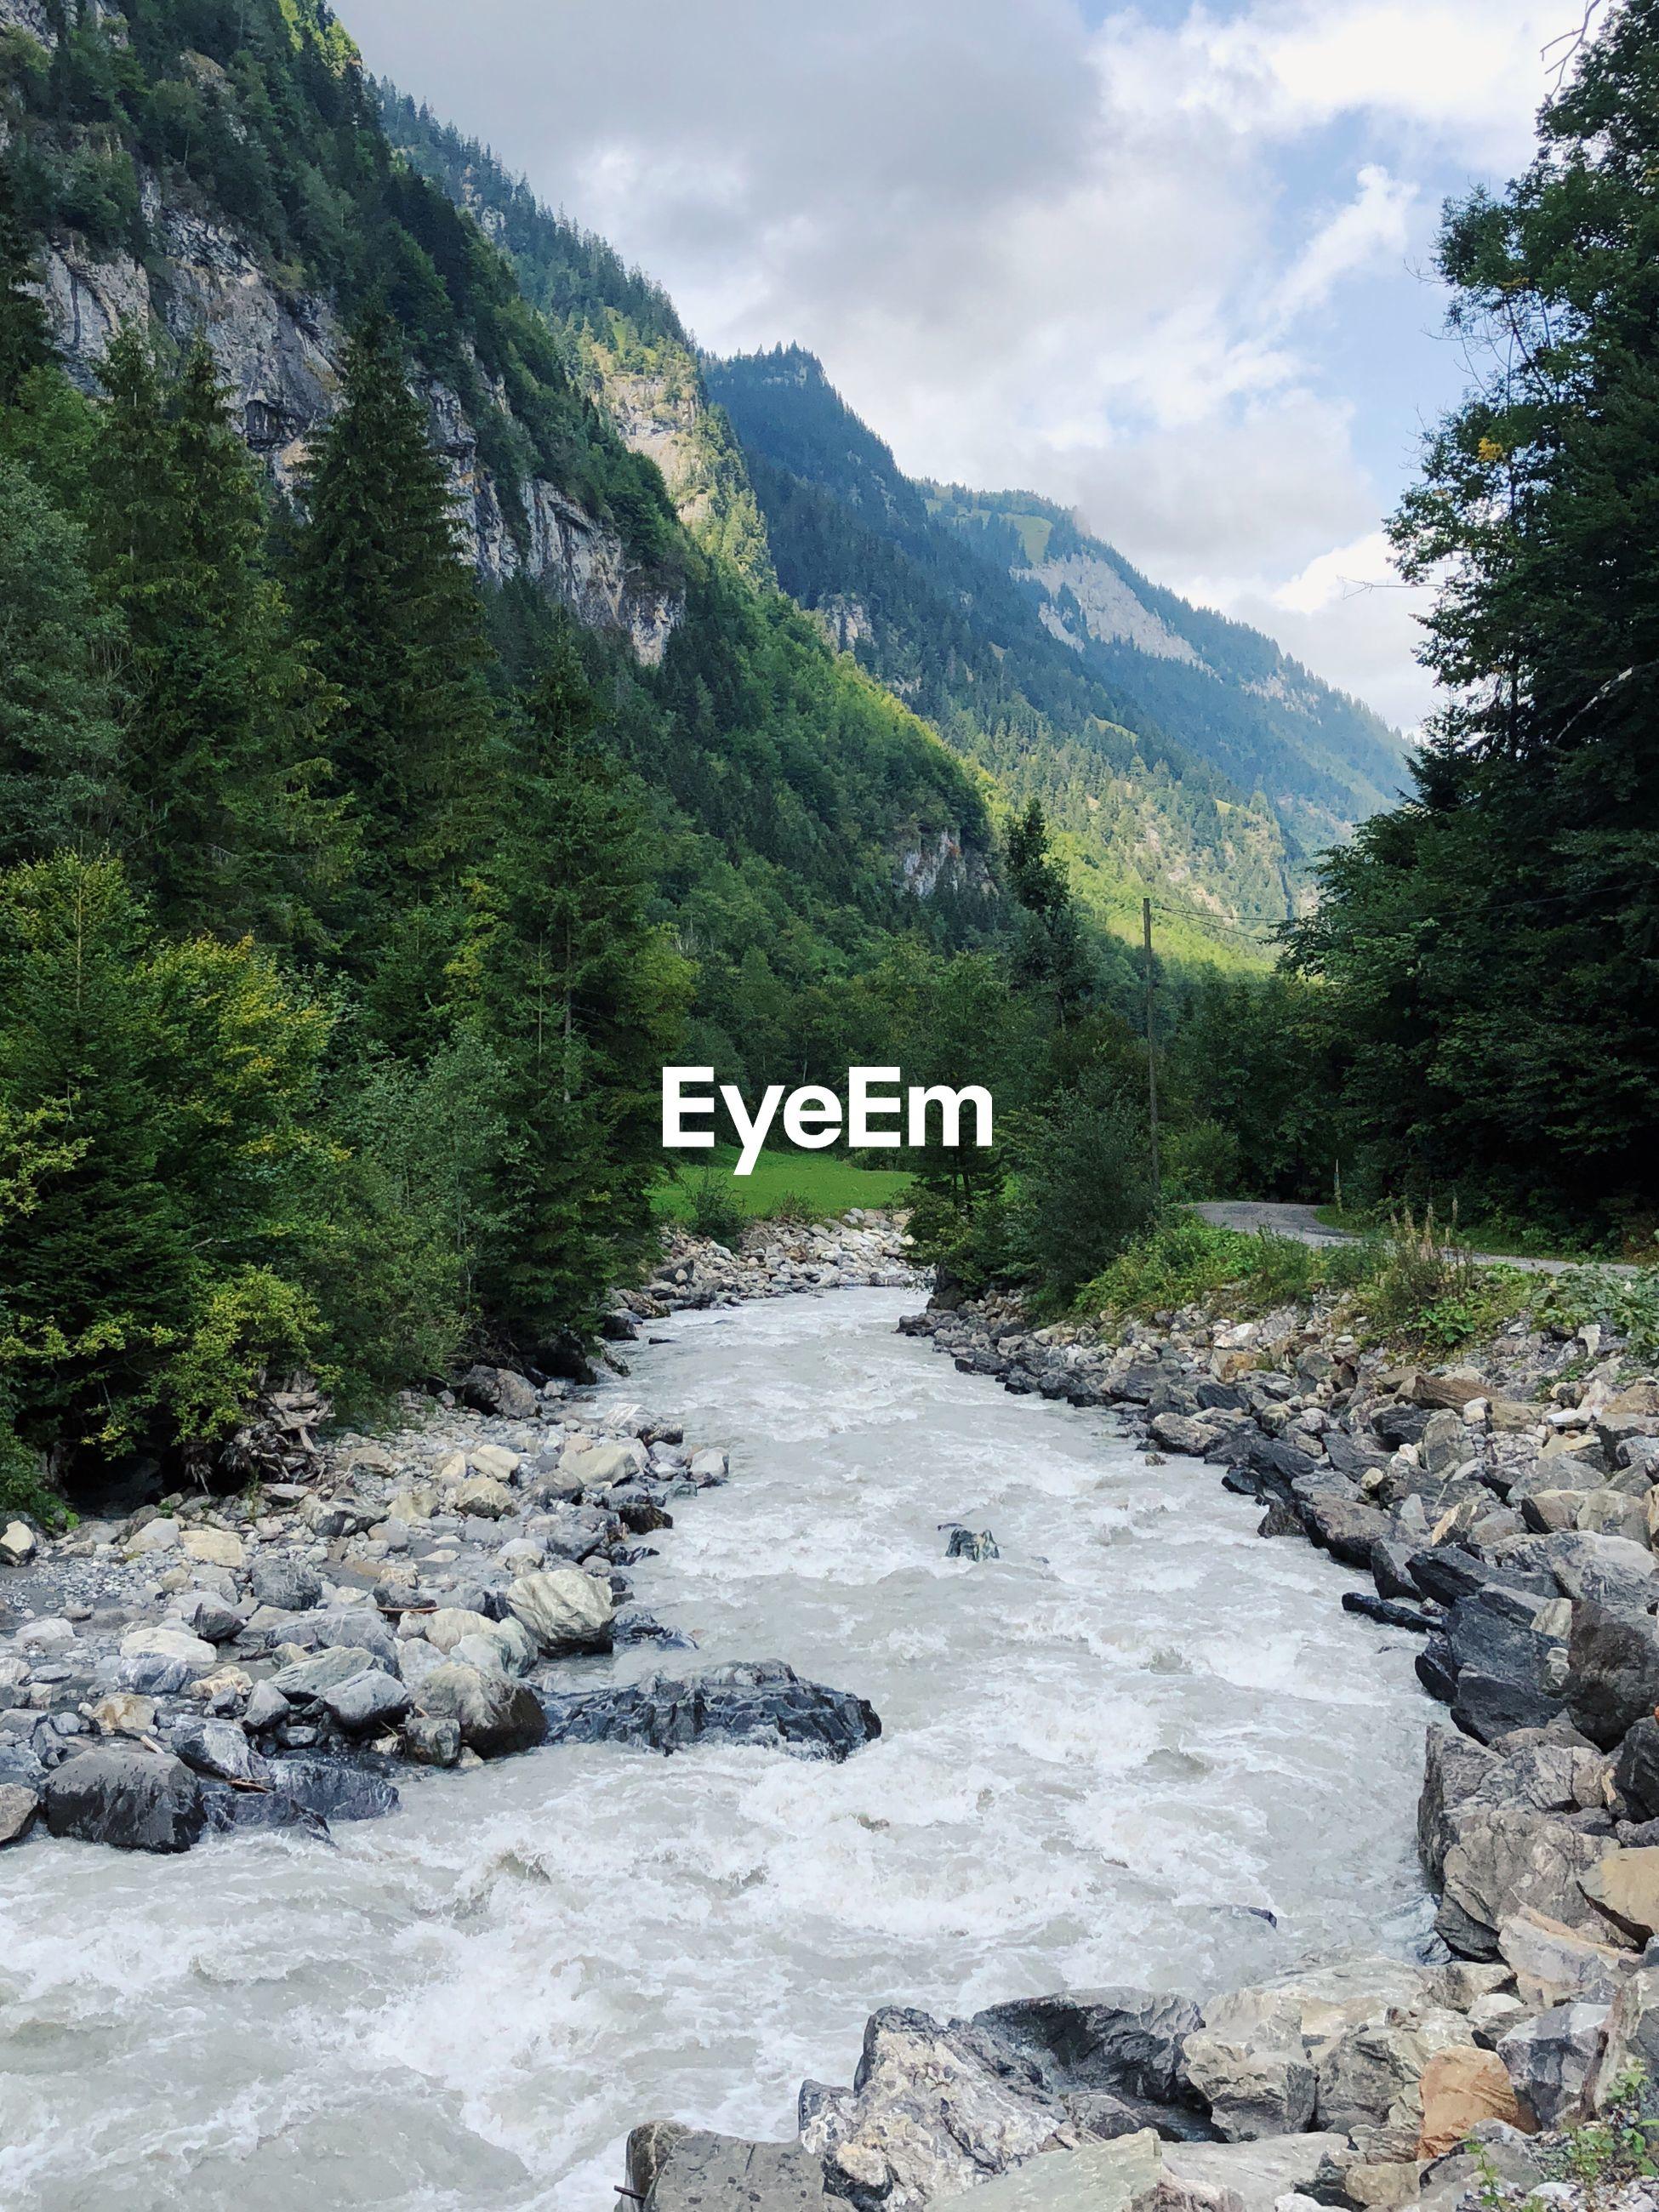 STREAM FLOWING THROUGH ROCKS IN MOUNTAINS